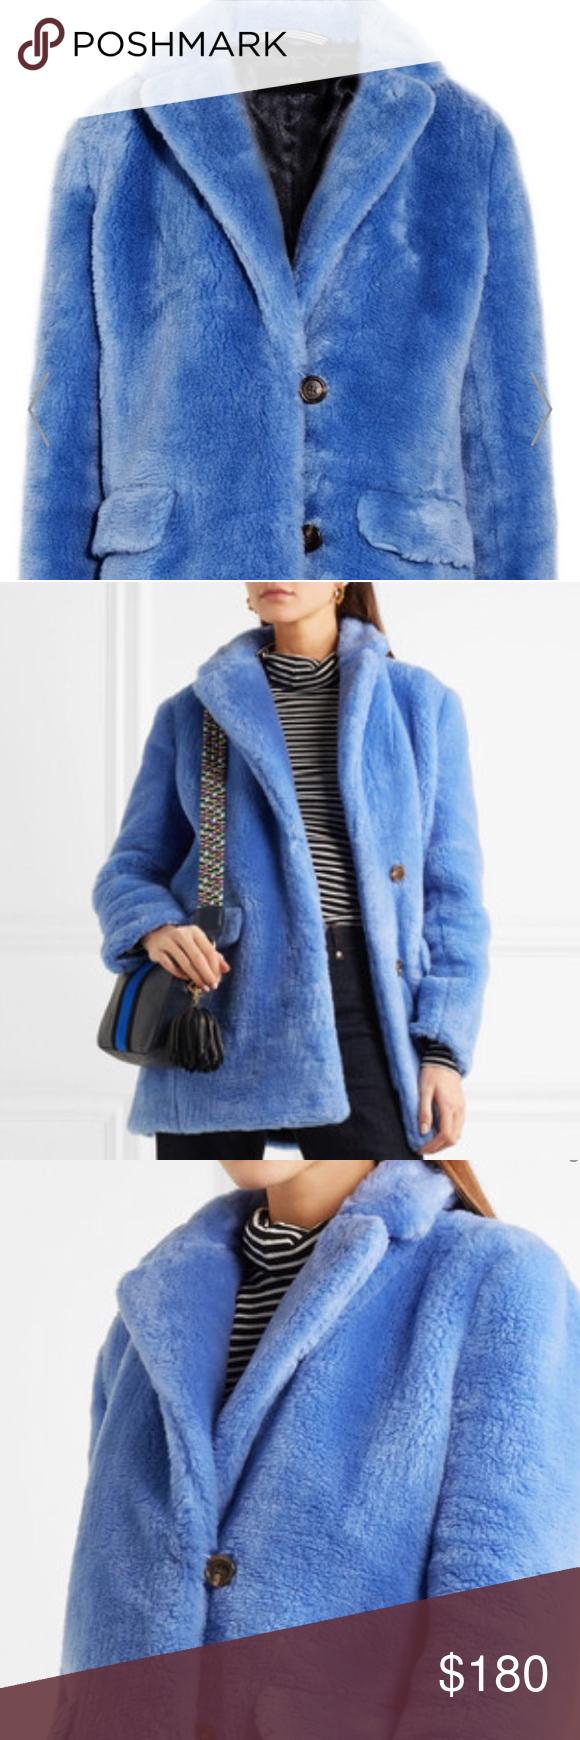 JCrew Yana Faux Fur Coat Brand new, with tags. Great coat! Retail $250. J. Crew Jackets & Coats Pea Coats